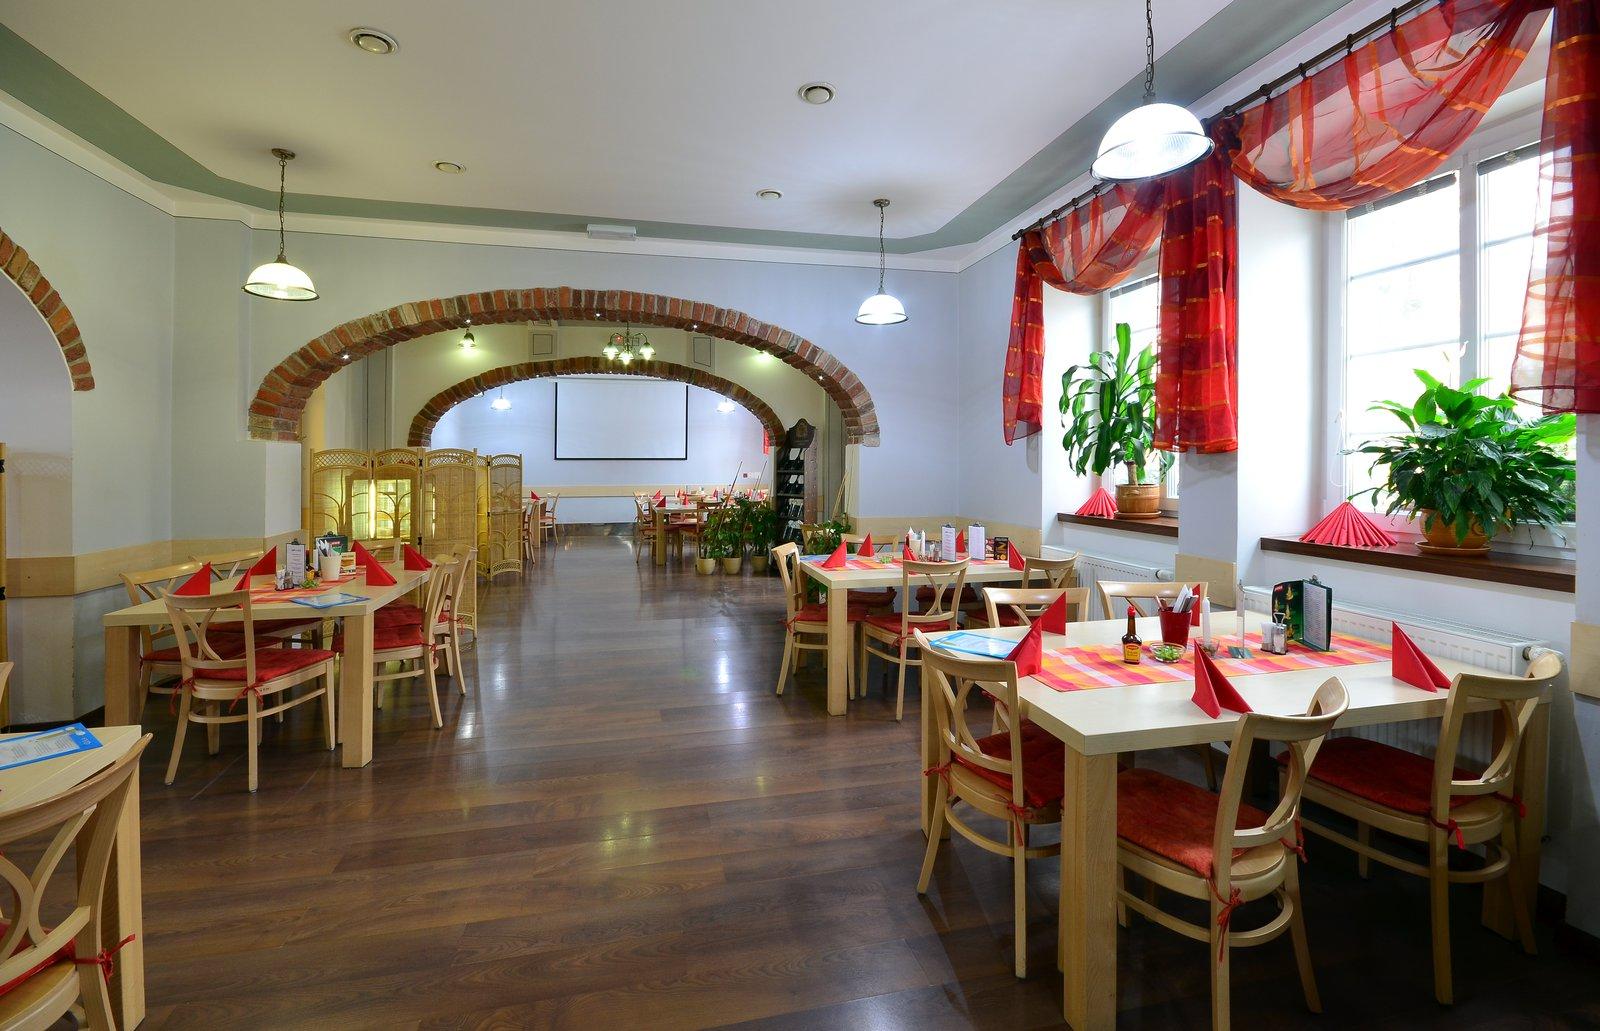 anglina.uNas.cz - angličtina online a zdarma anglická slovíčka restaurant